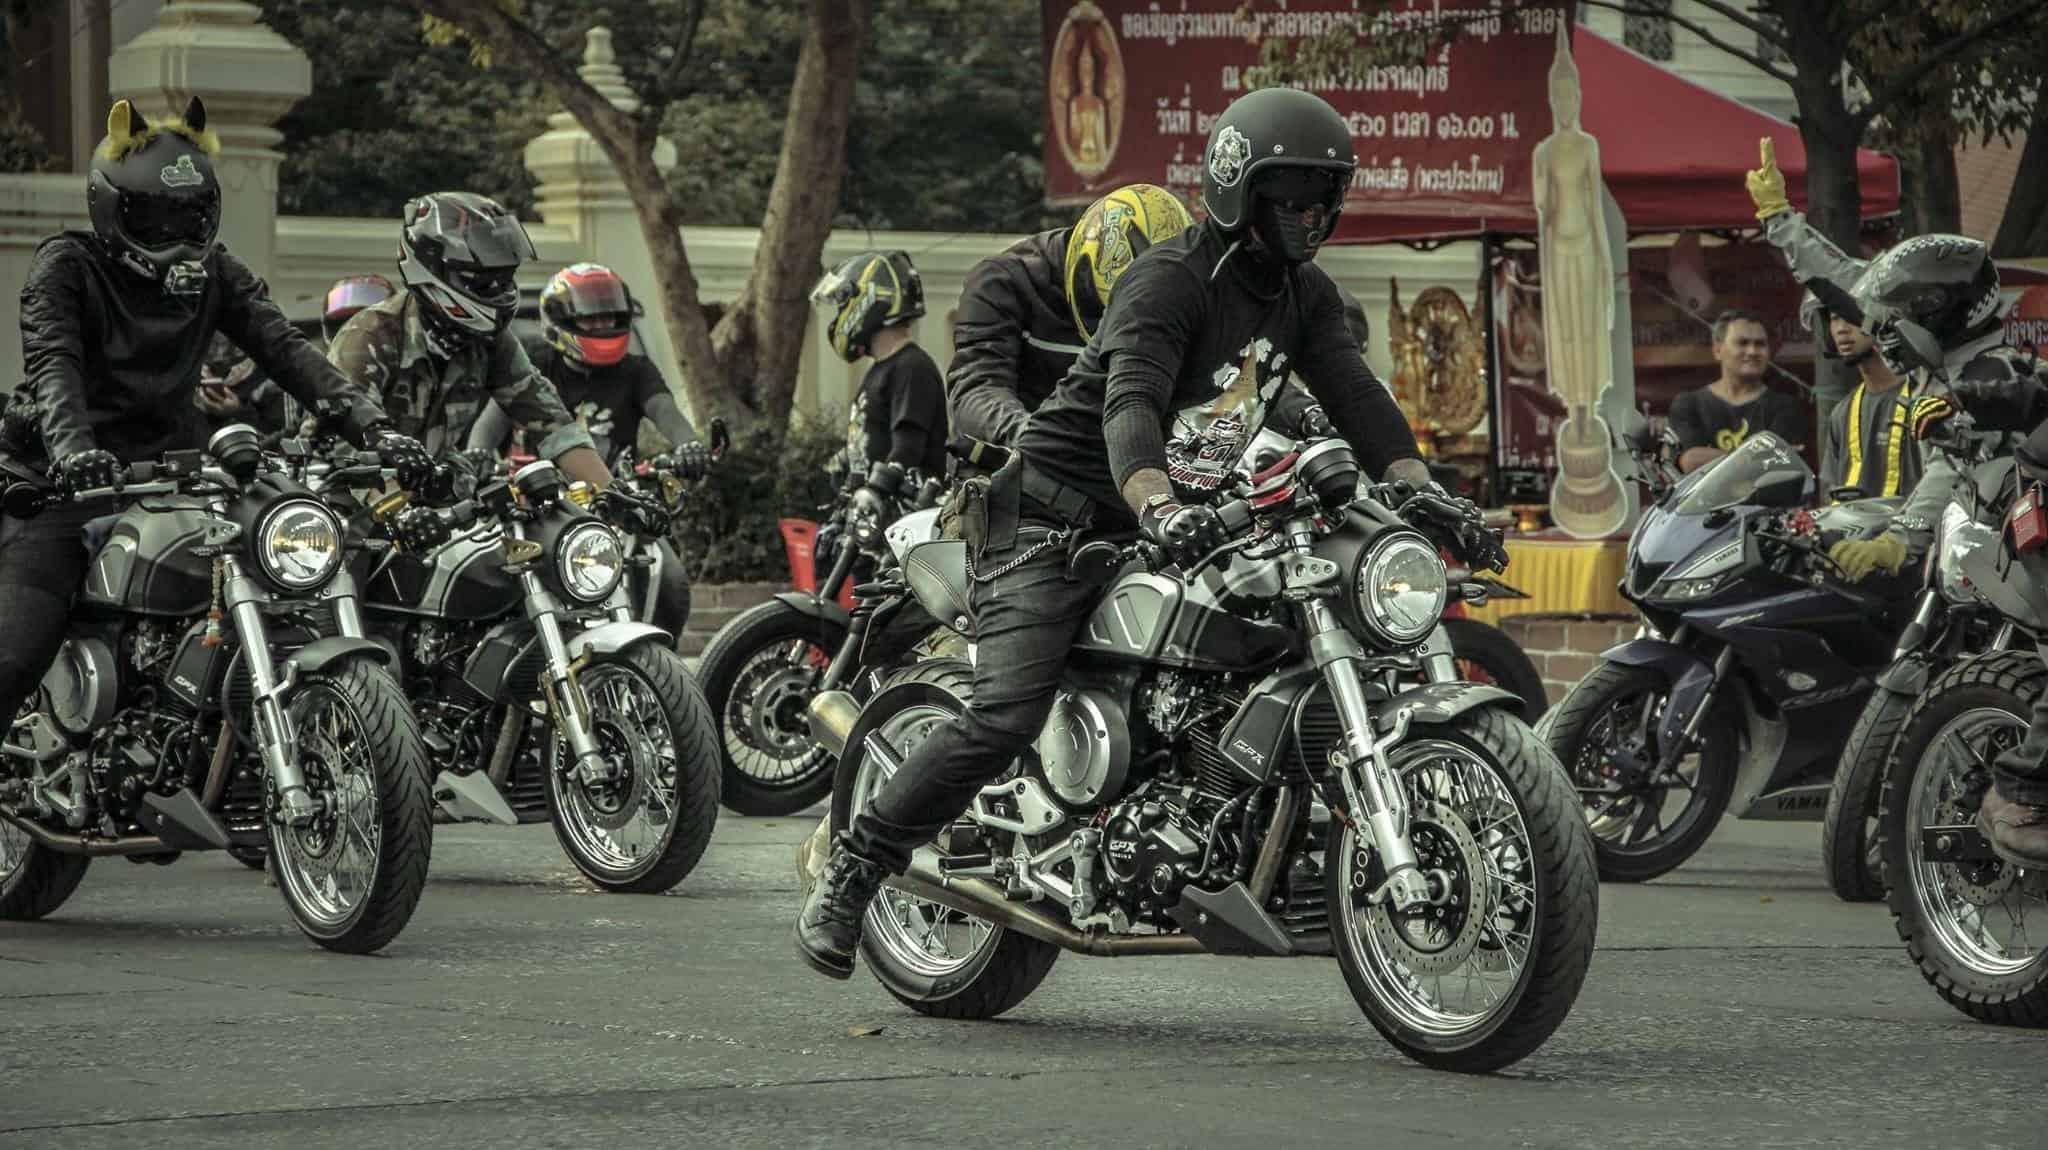 group biker gpx gentleman thai